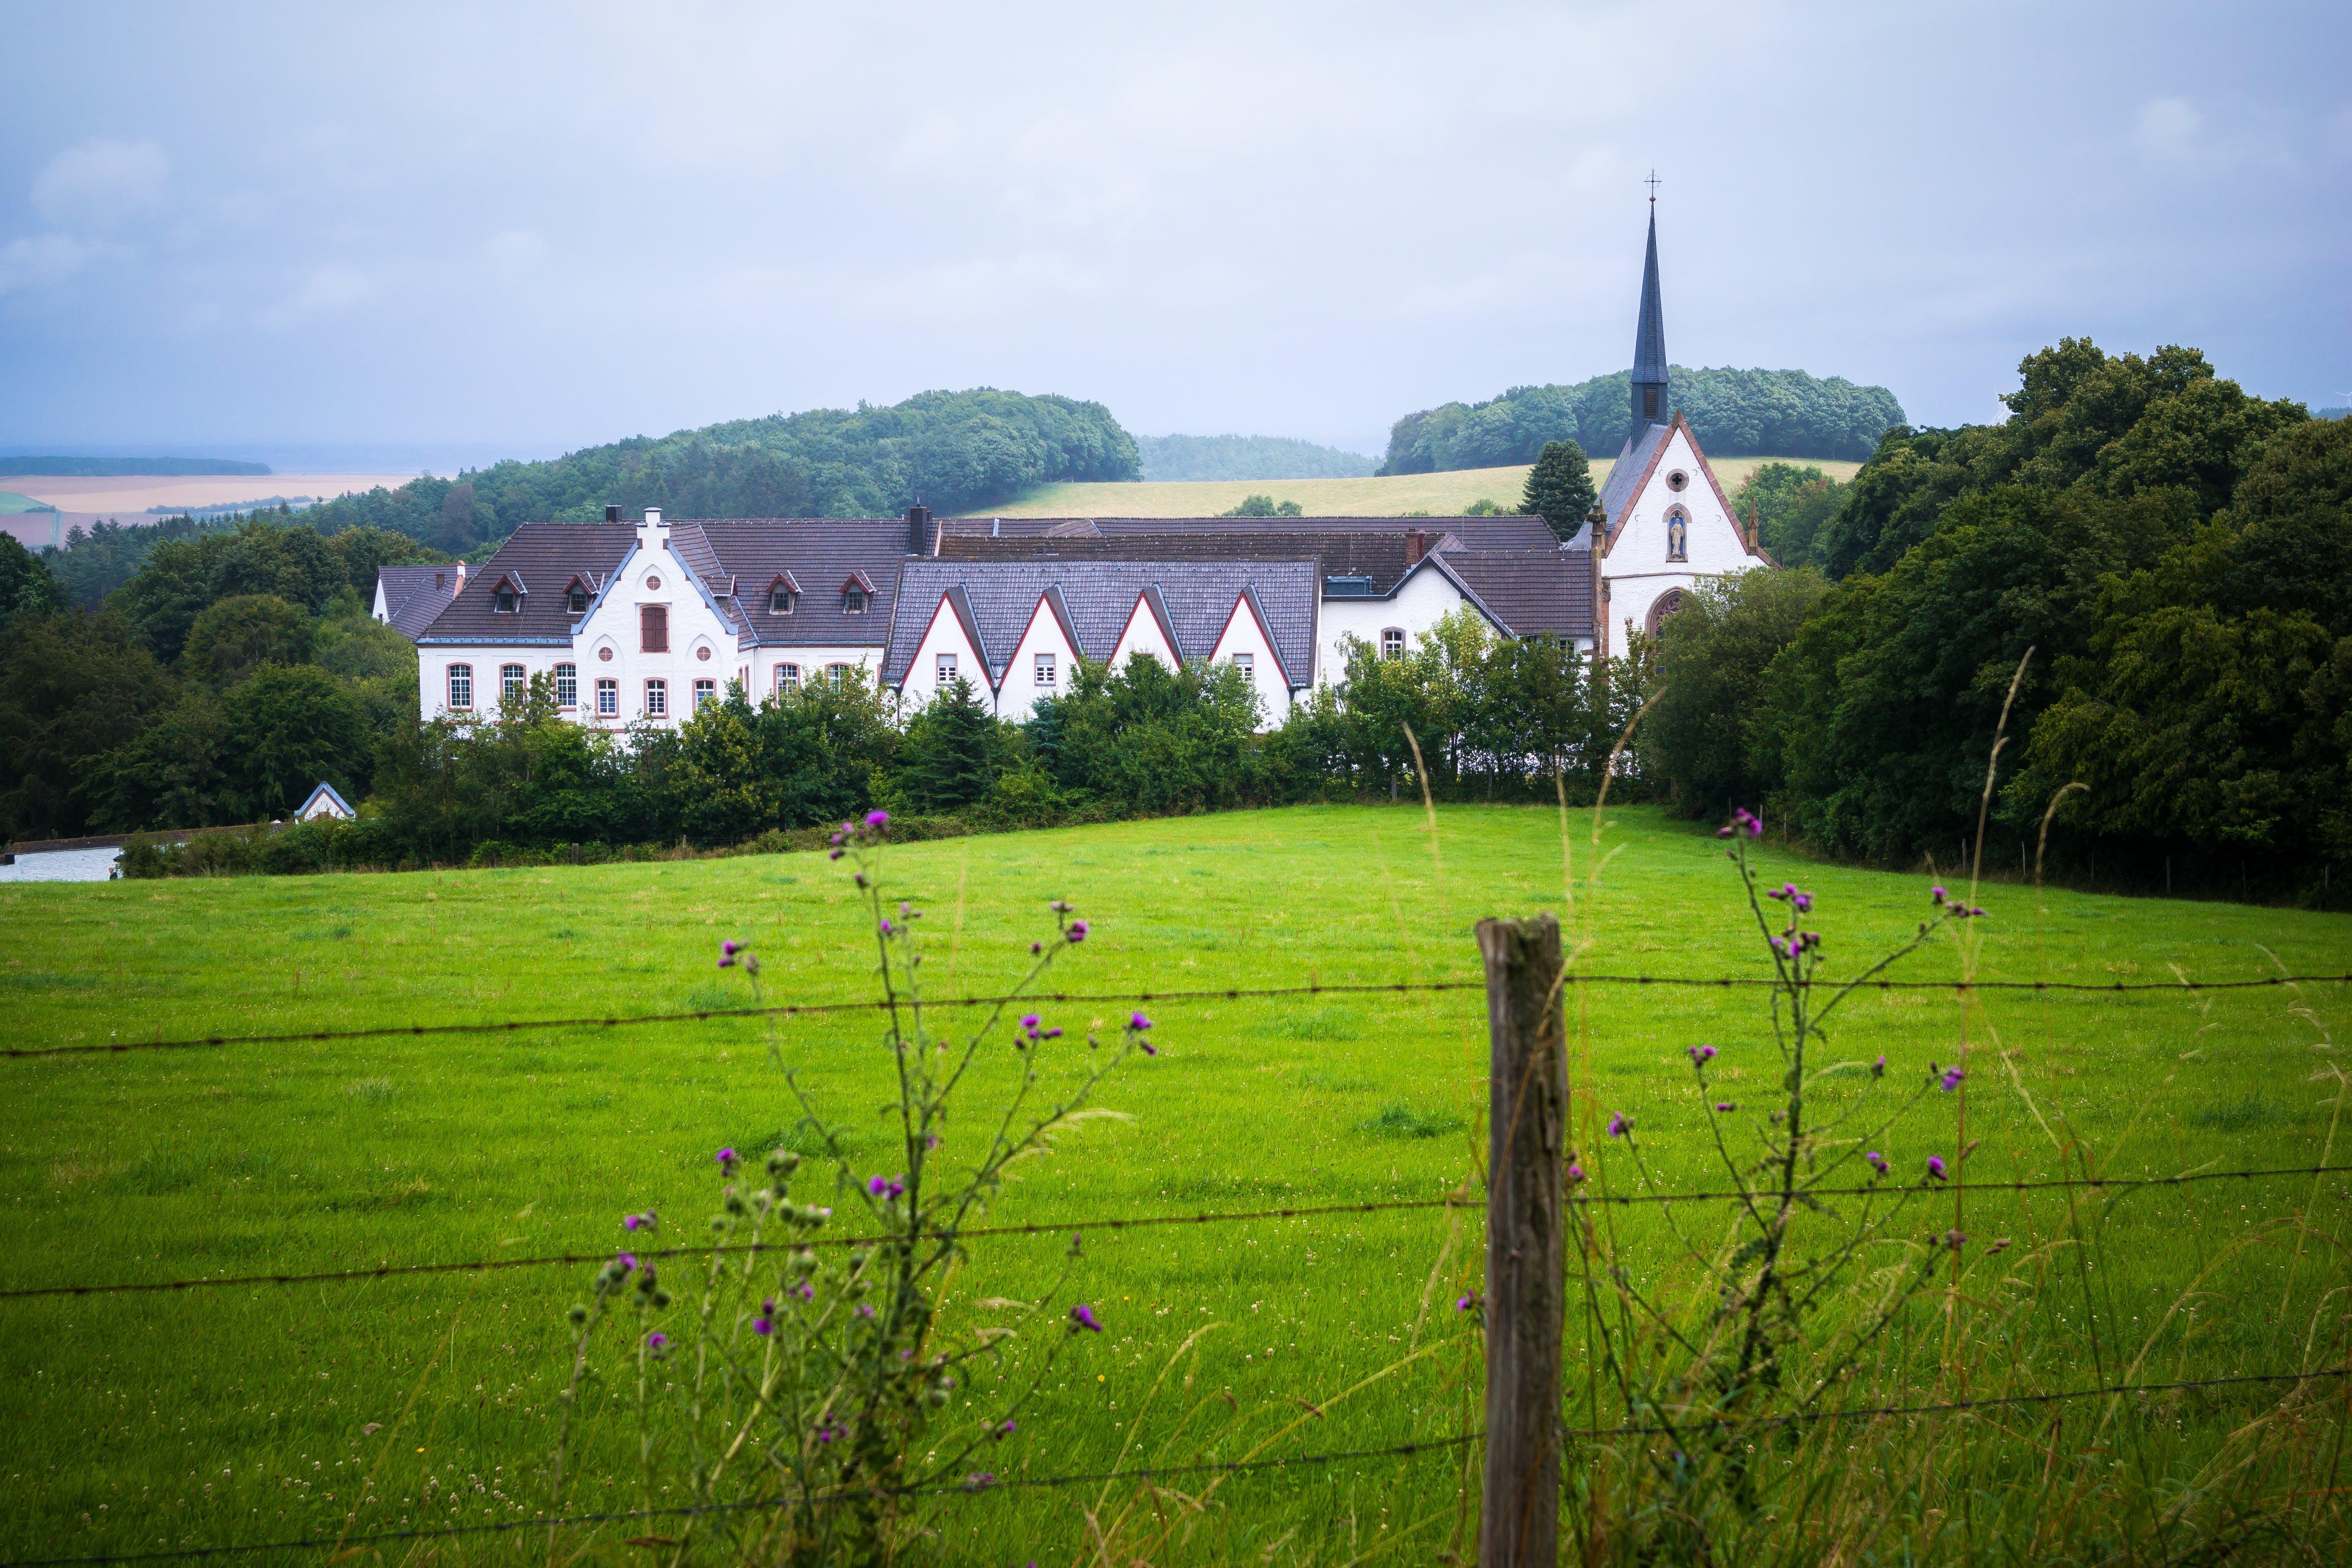 White and Gray Church